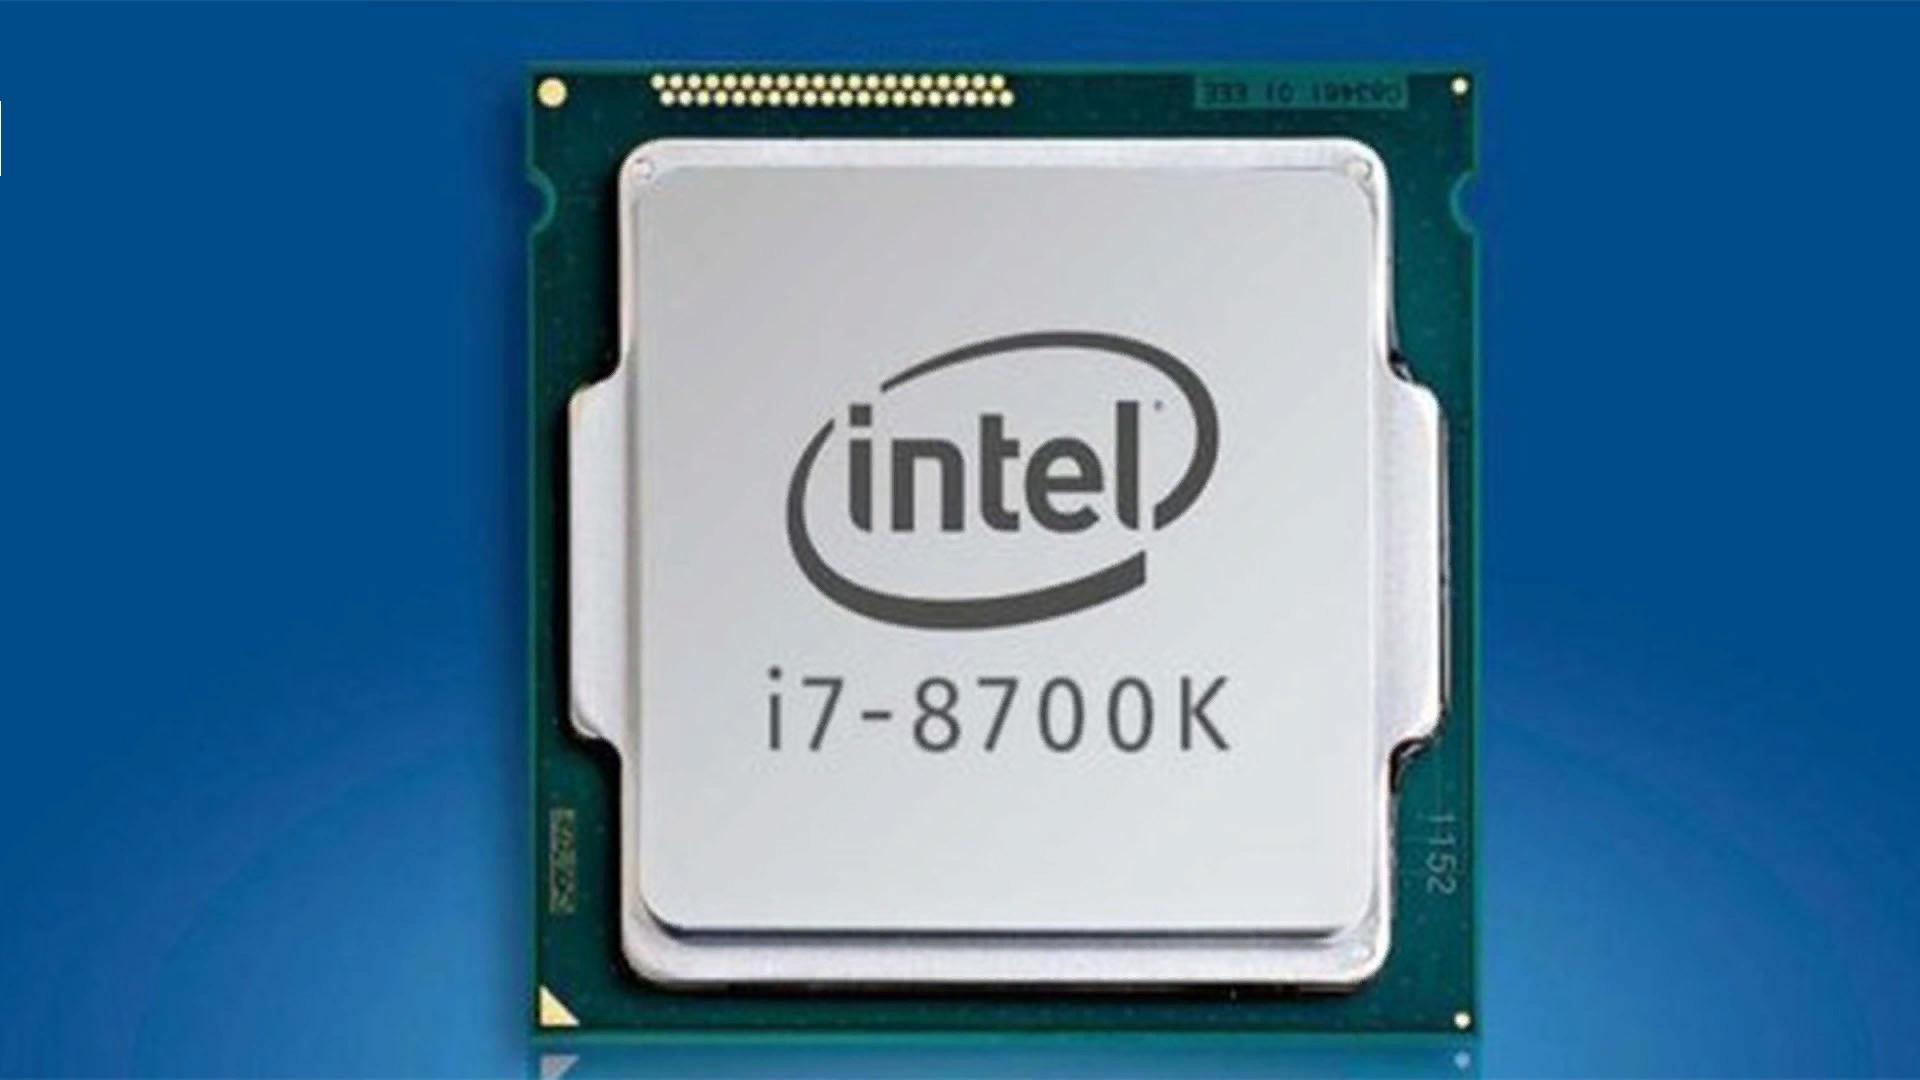 Рис. 9. Процессор i7-8700K.